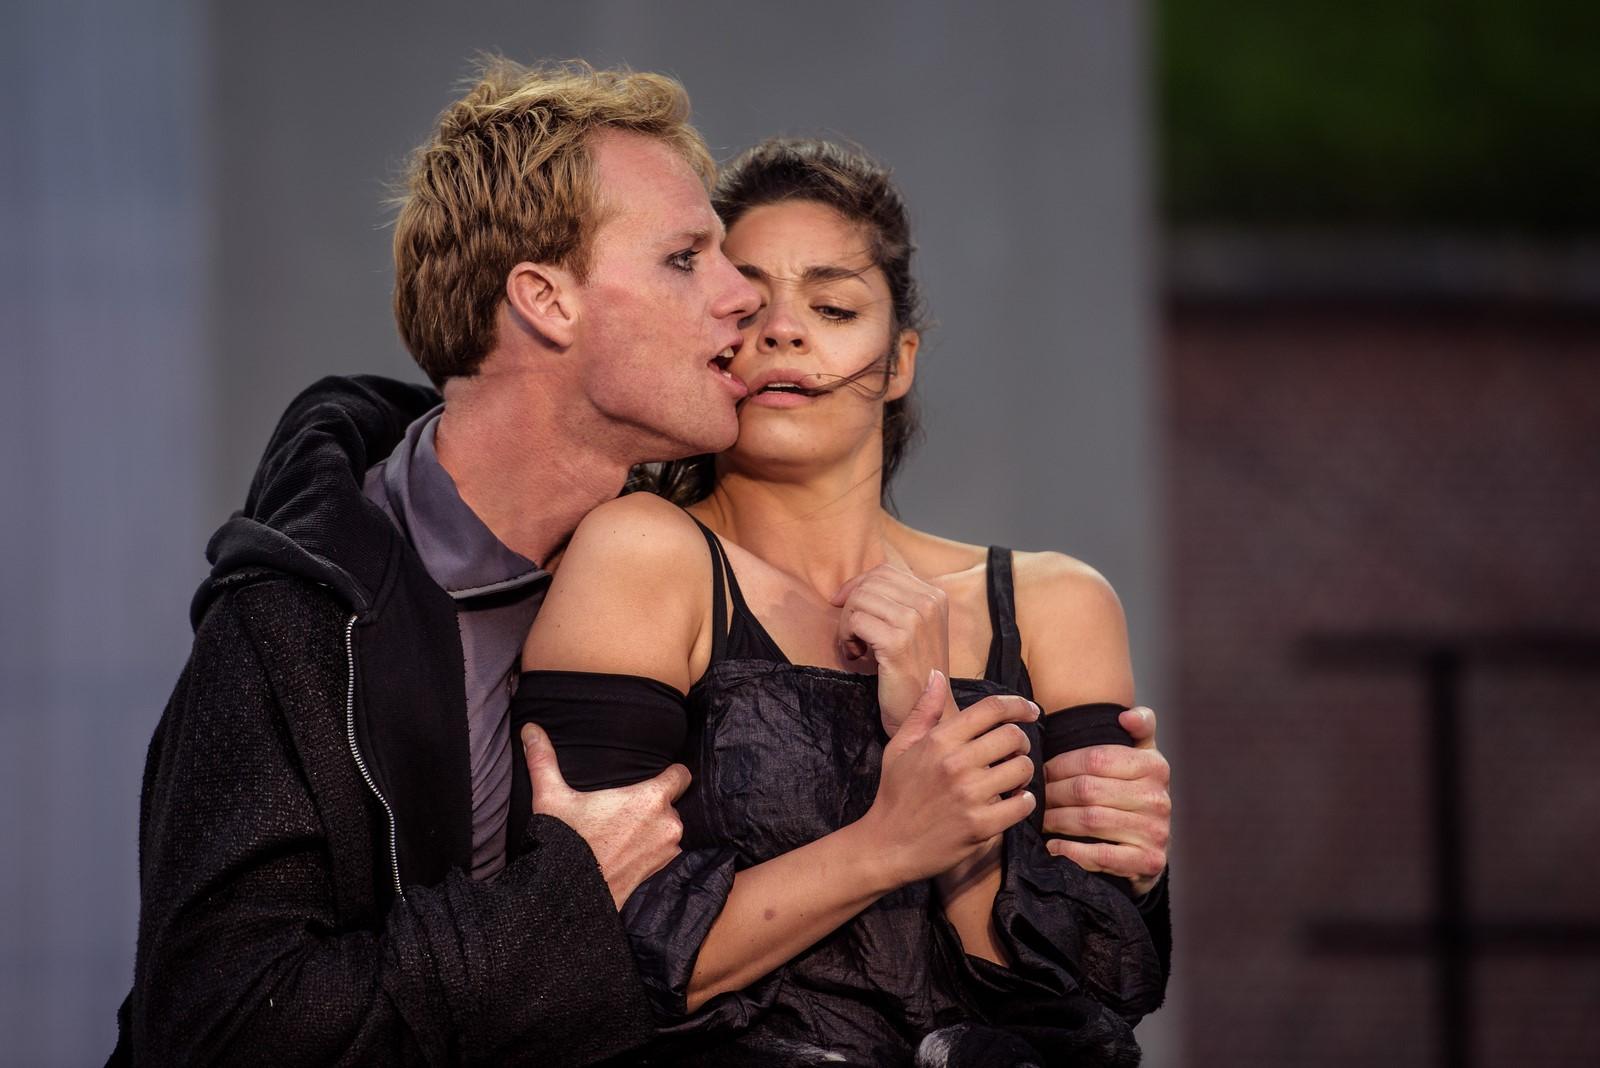 Anmeldelse: Hamlet, Kronborg (HamletScenen i samarbejde med London Toast Theatre)